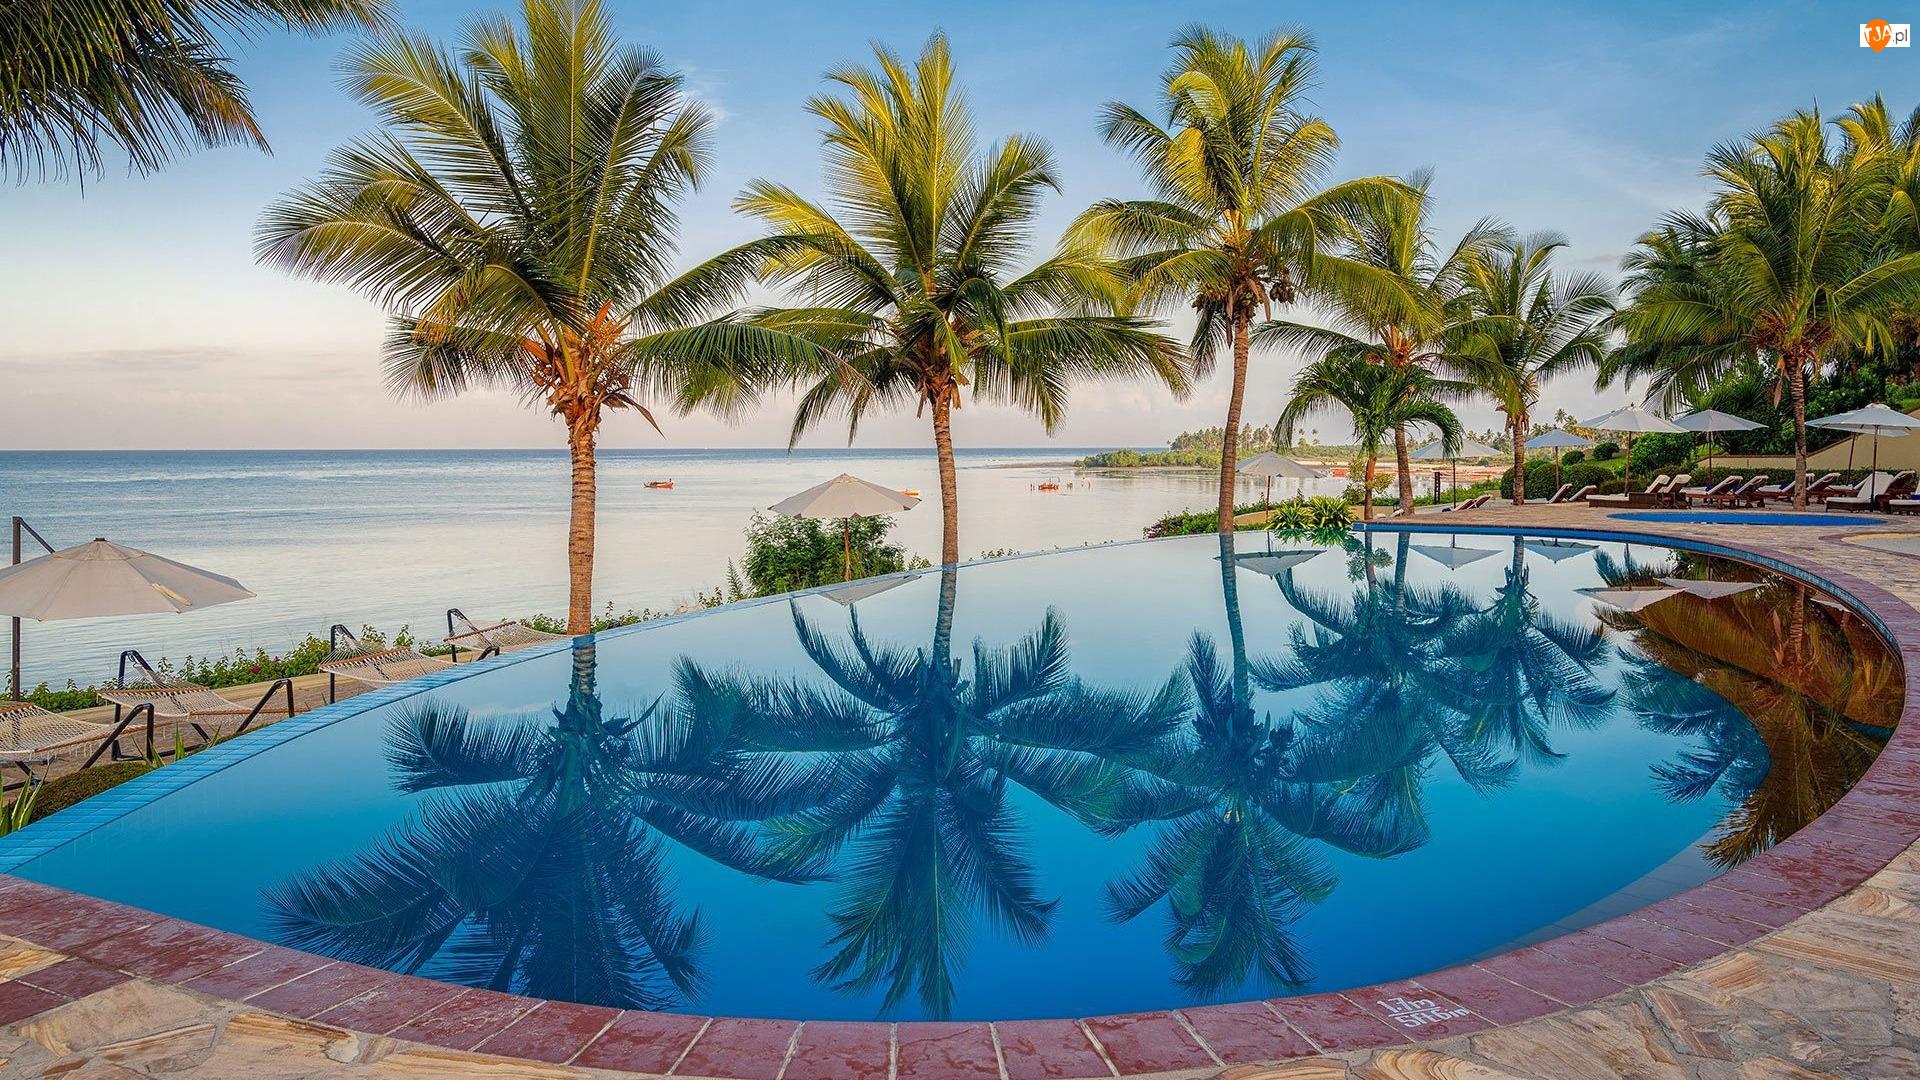 Basen, Hotel, Tanzania, Palmy, Wyspa Zanzibar, Mangapwani, Sea Cliff Resort Spa